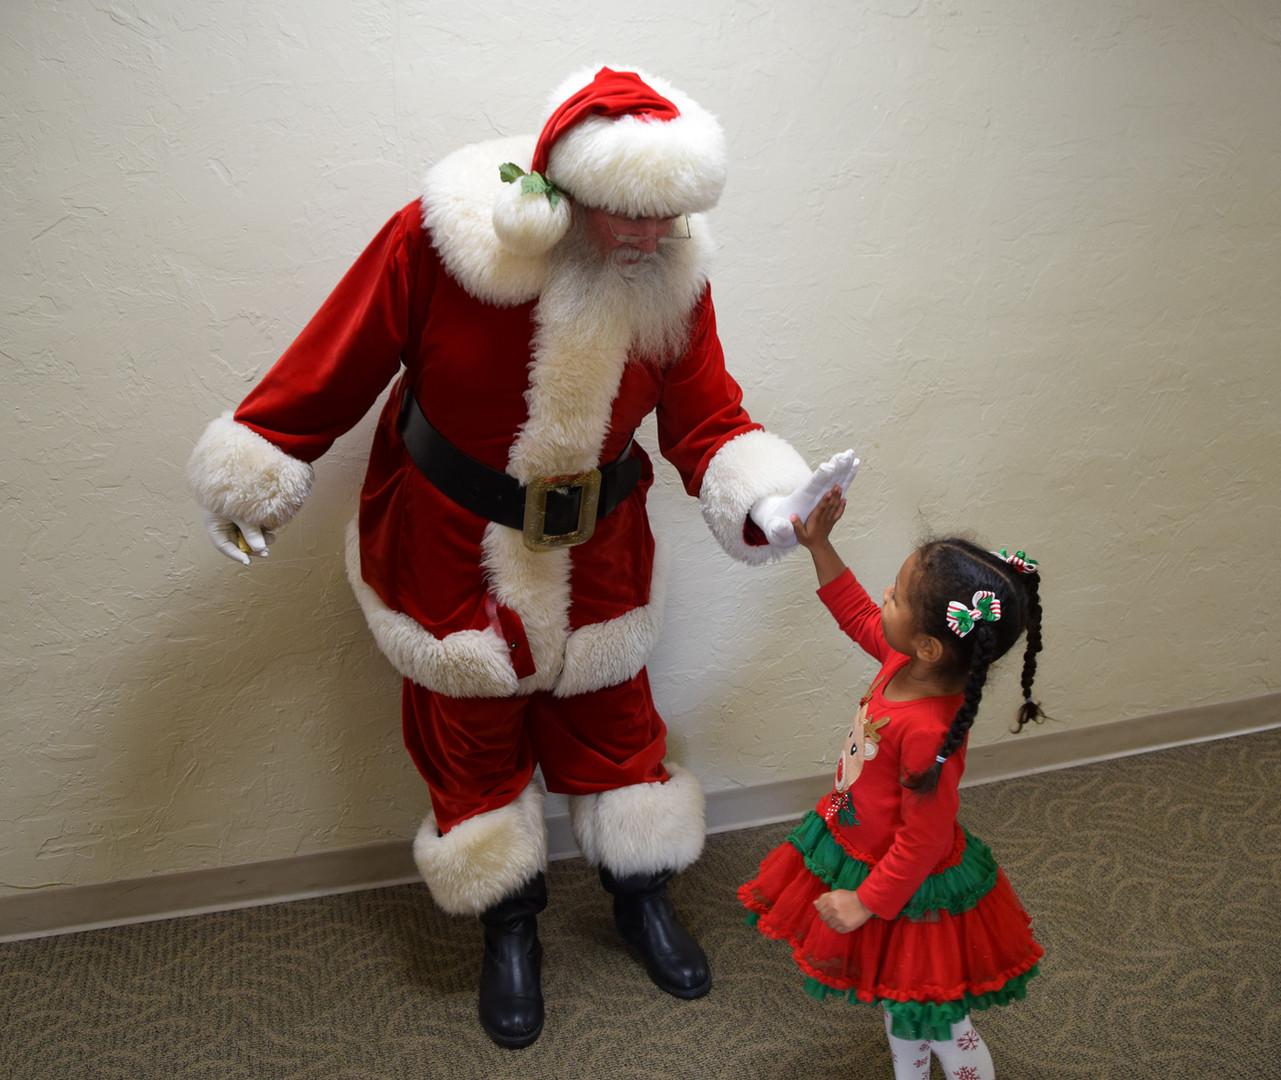 Afterwards everyone got to visit with Santa.